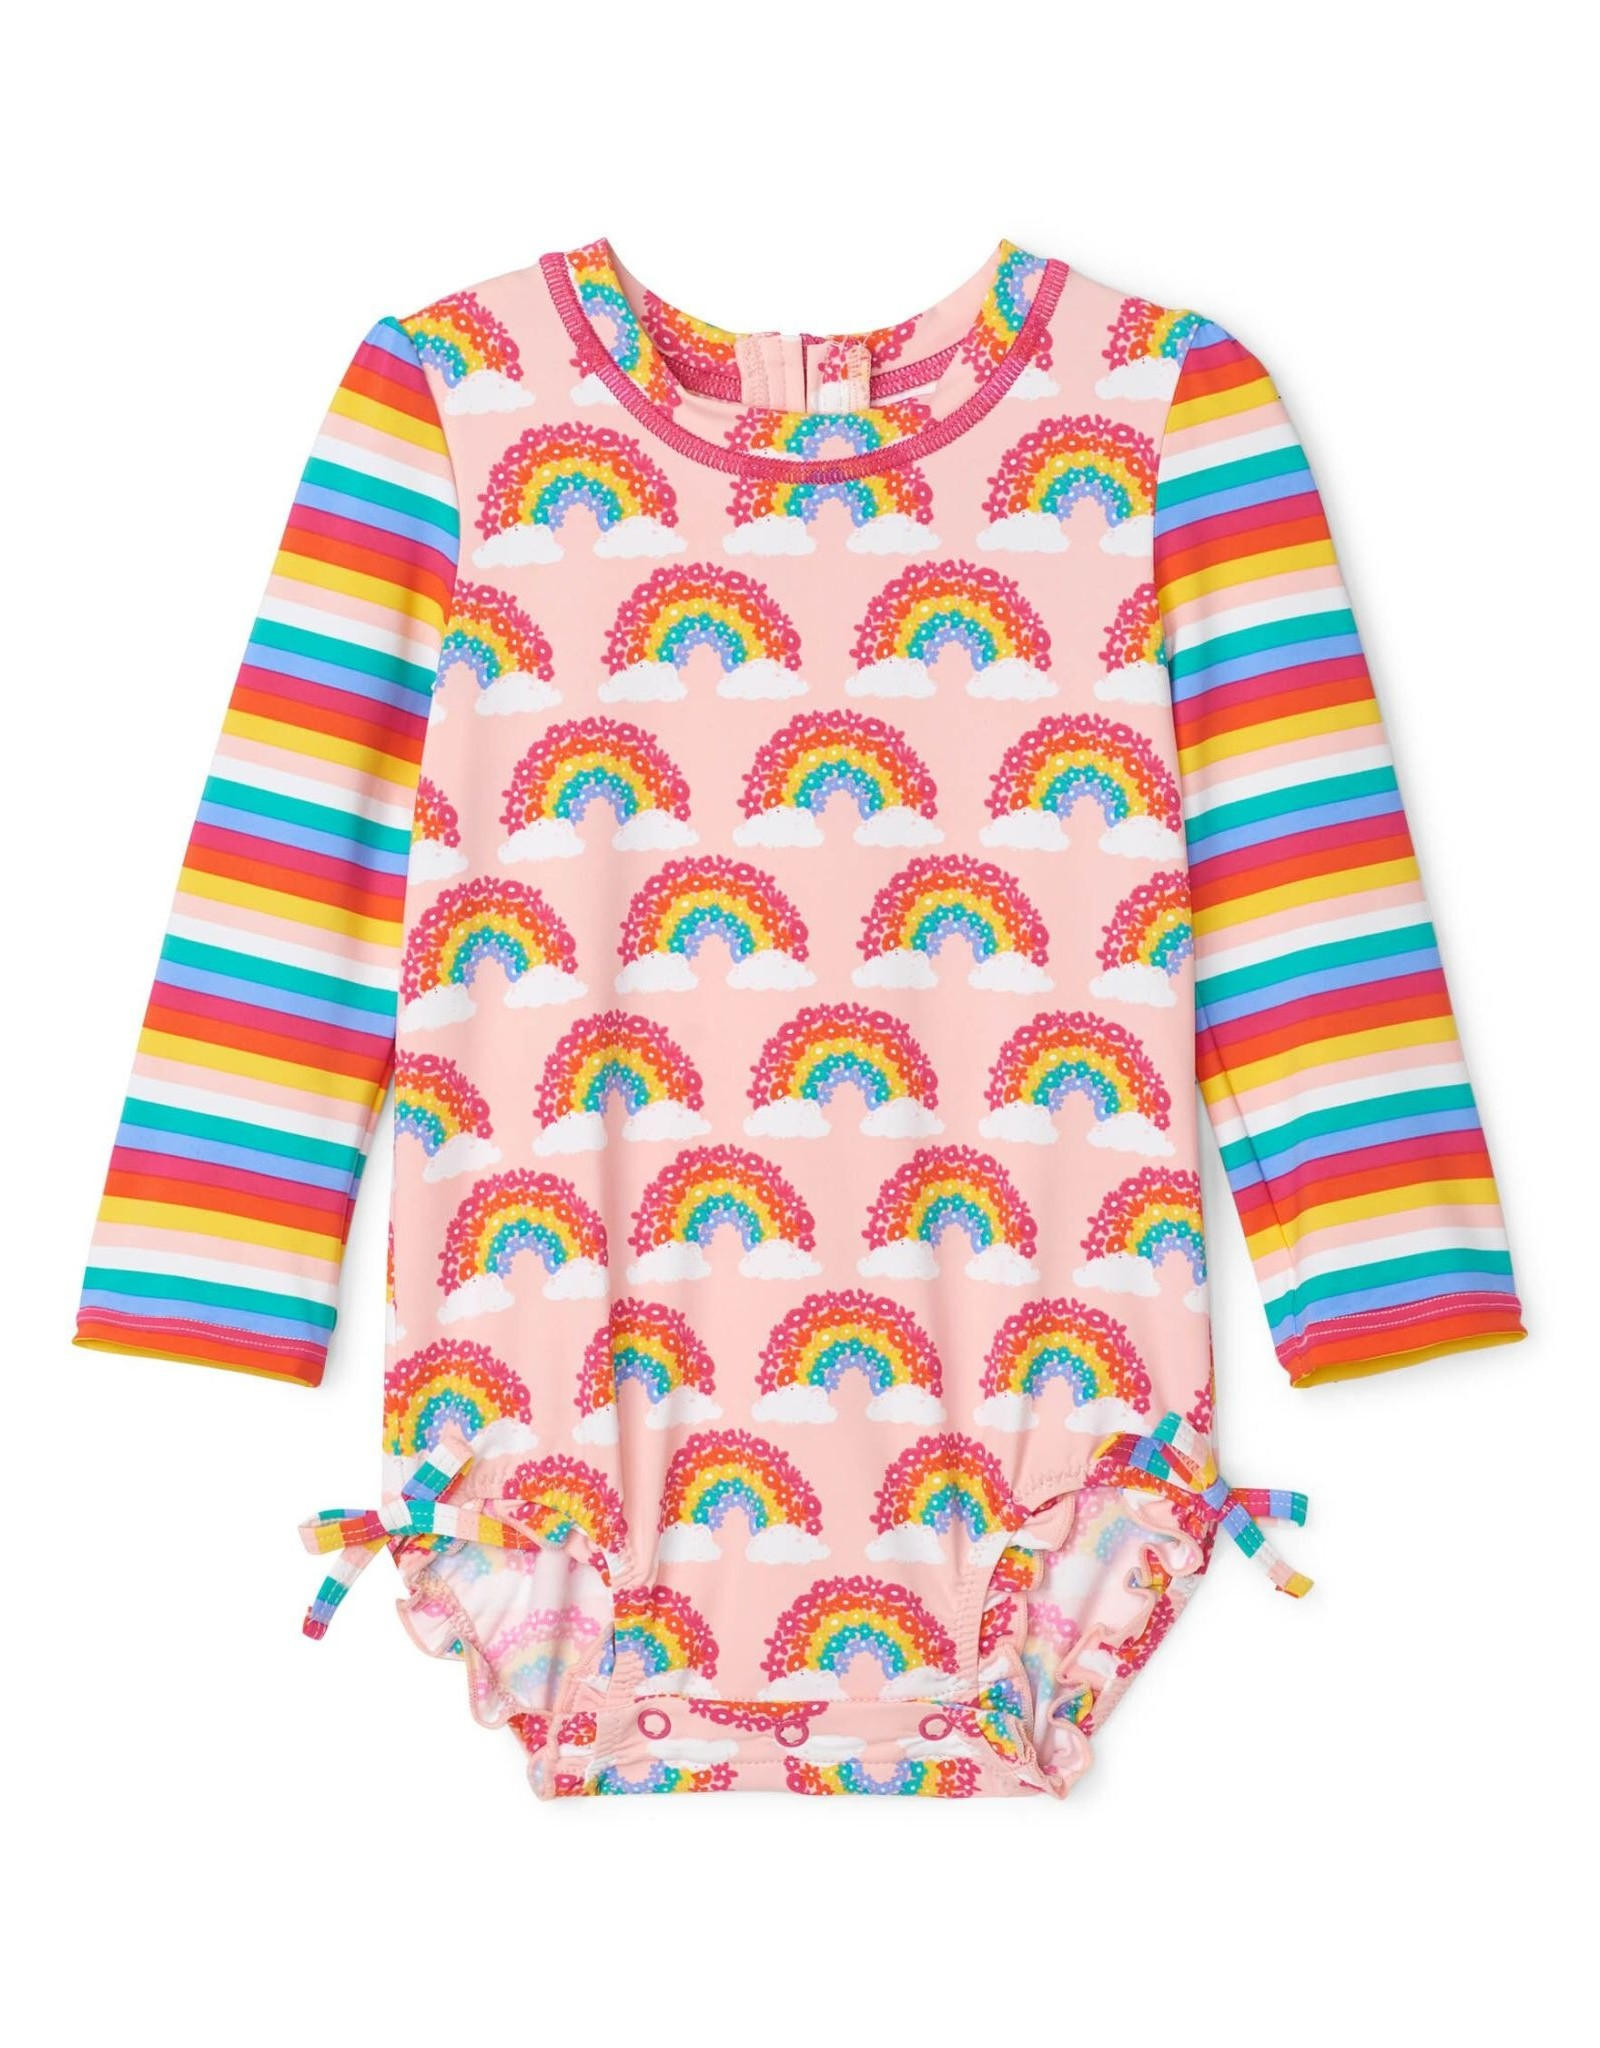 Hatley Magical Rainbows Baby Rashguard Swimsuit